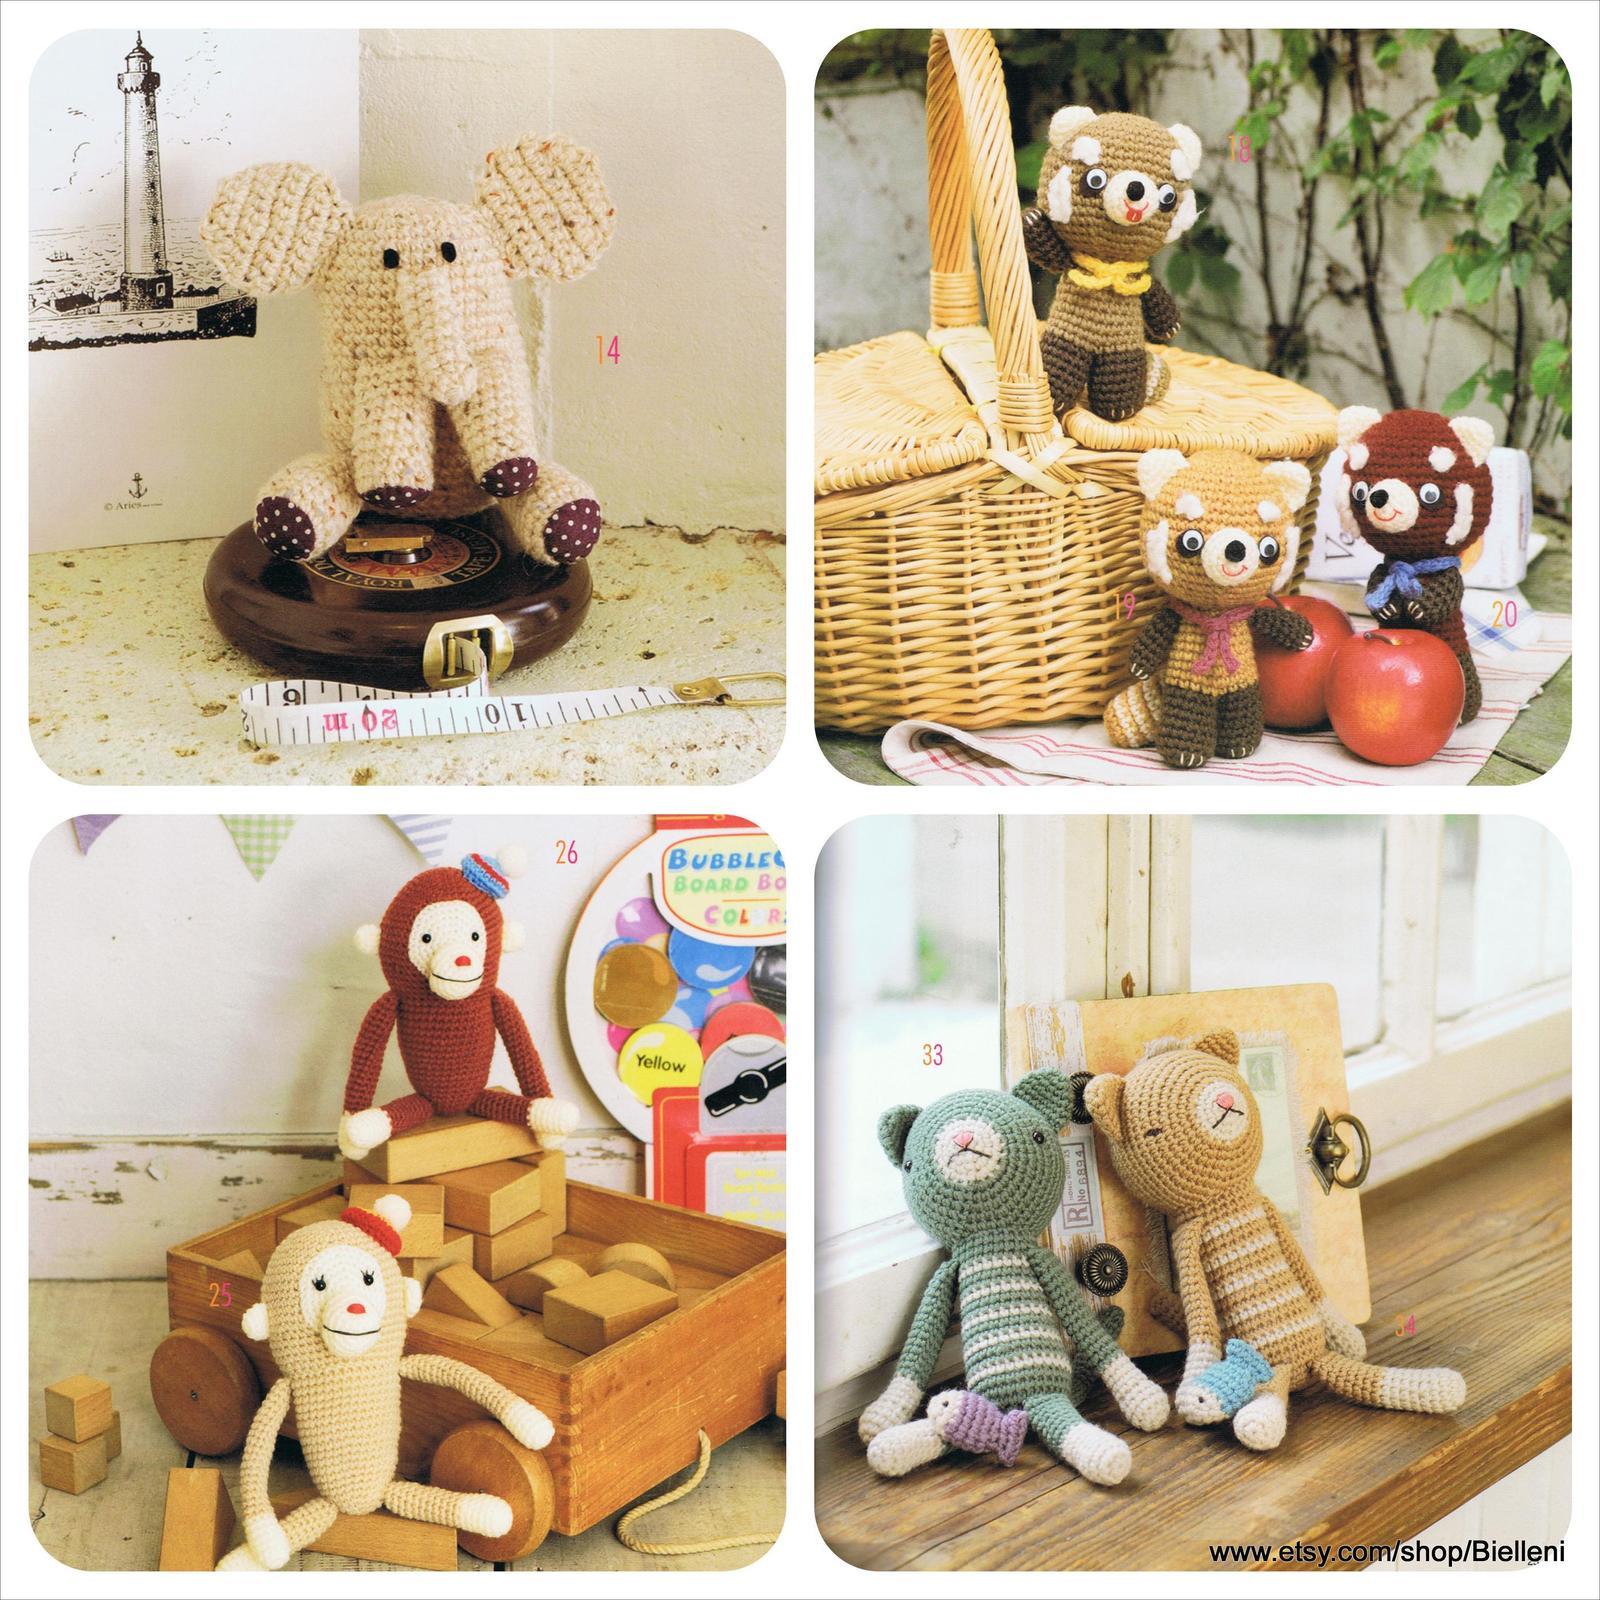 Japanese Amigurumi Doll Patterns : Amigurumi Japanese eBook Pattern (AMI14), Amigurumi ...